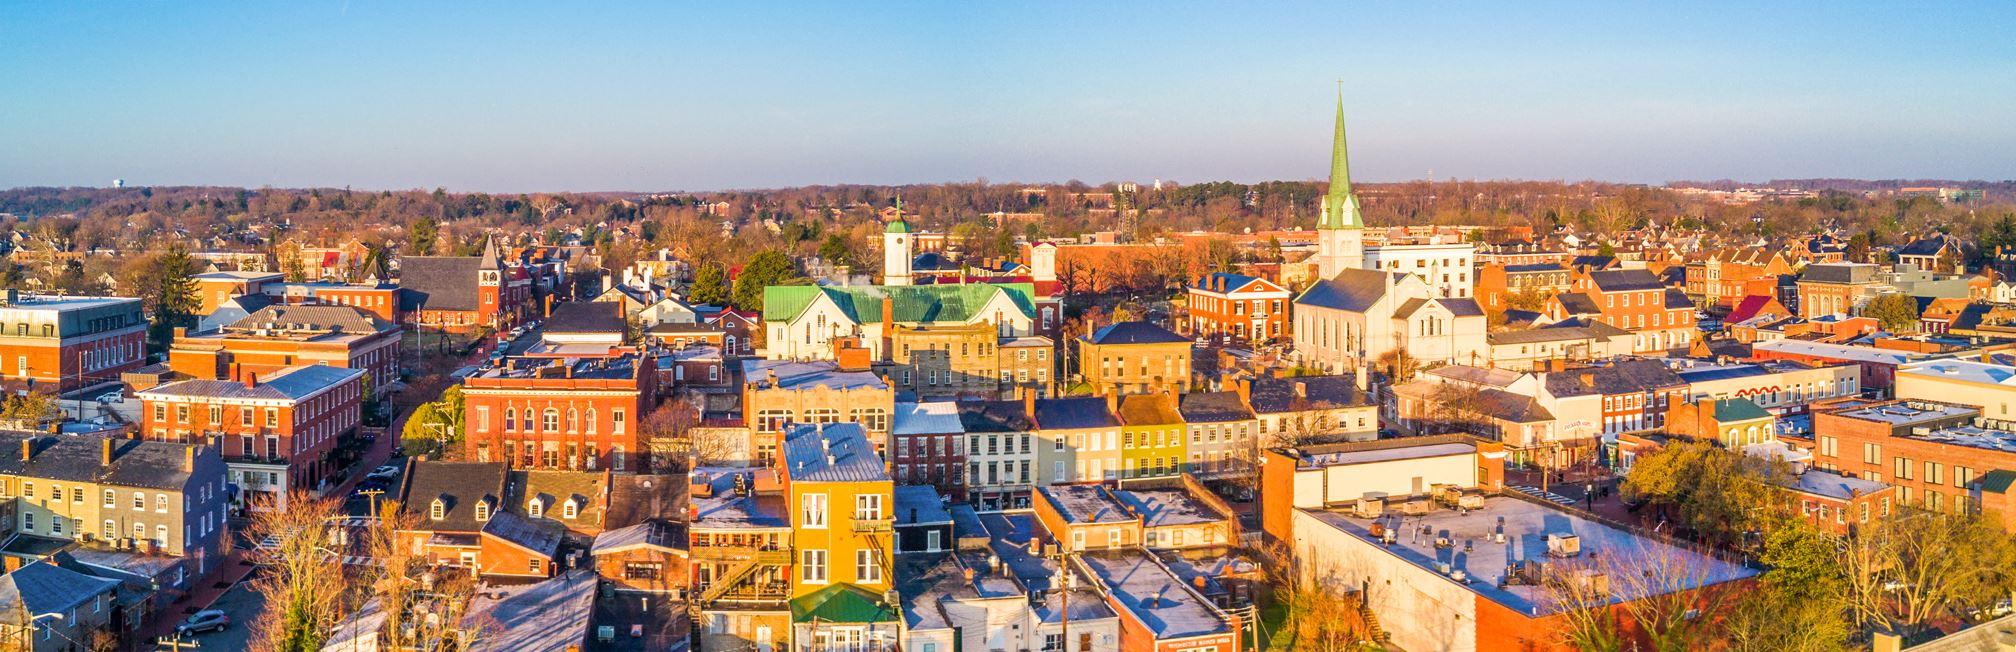 Fredericksburg, VA - Official Website | Official Website